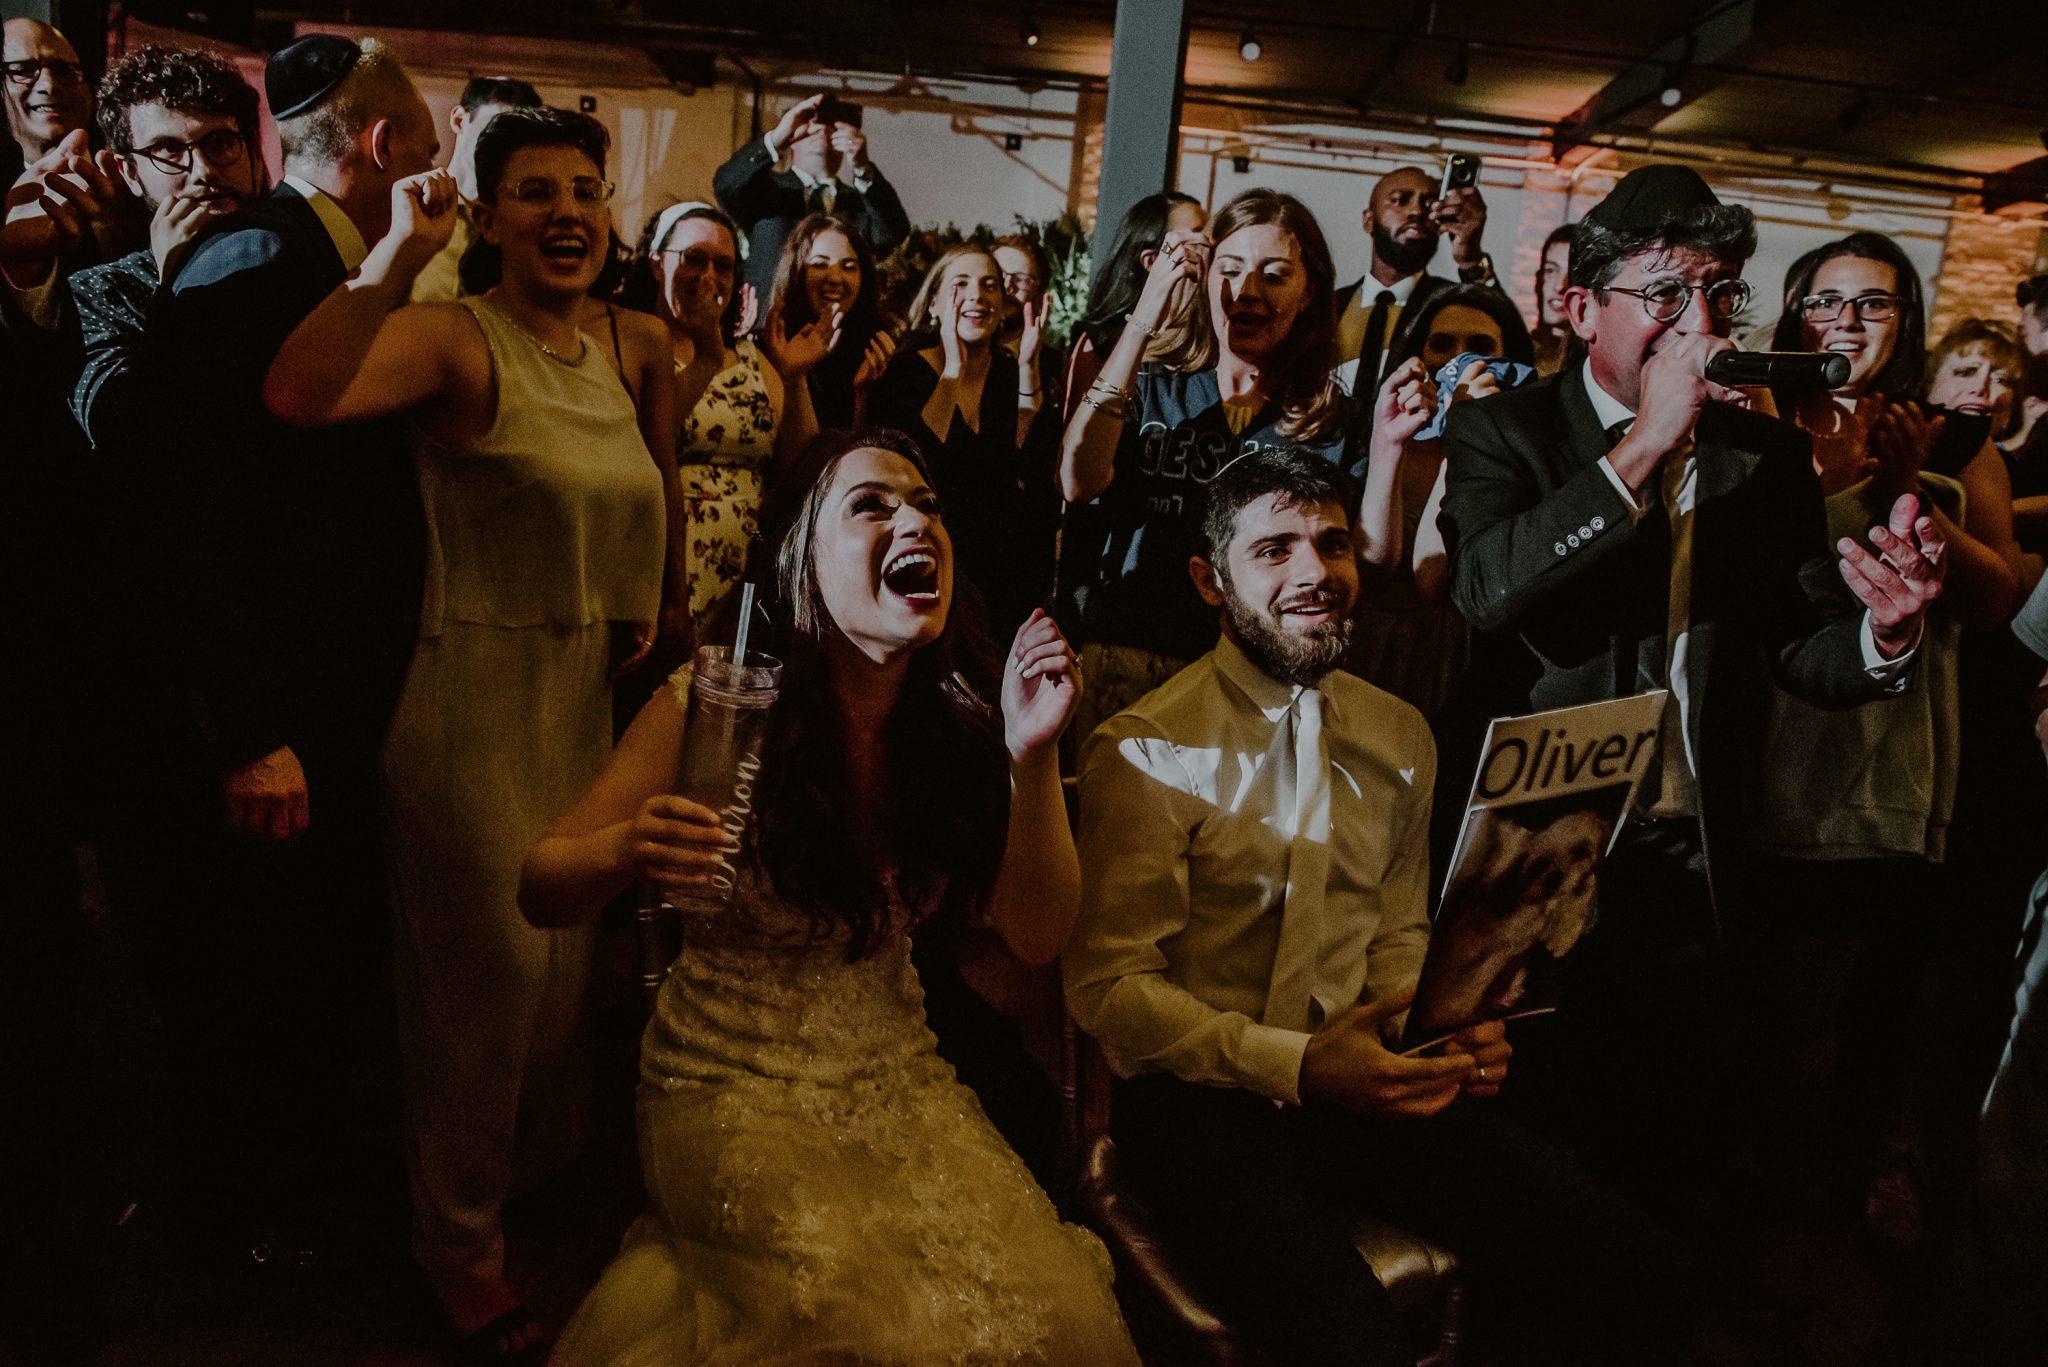 Brooklyn Jewish wedding photos